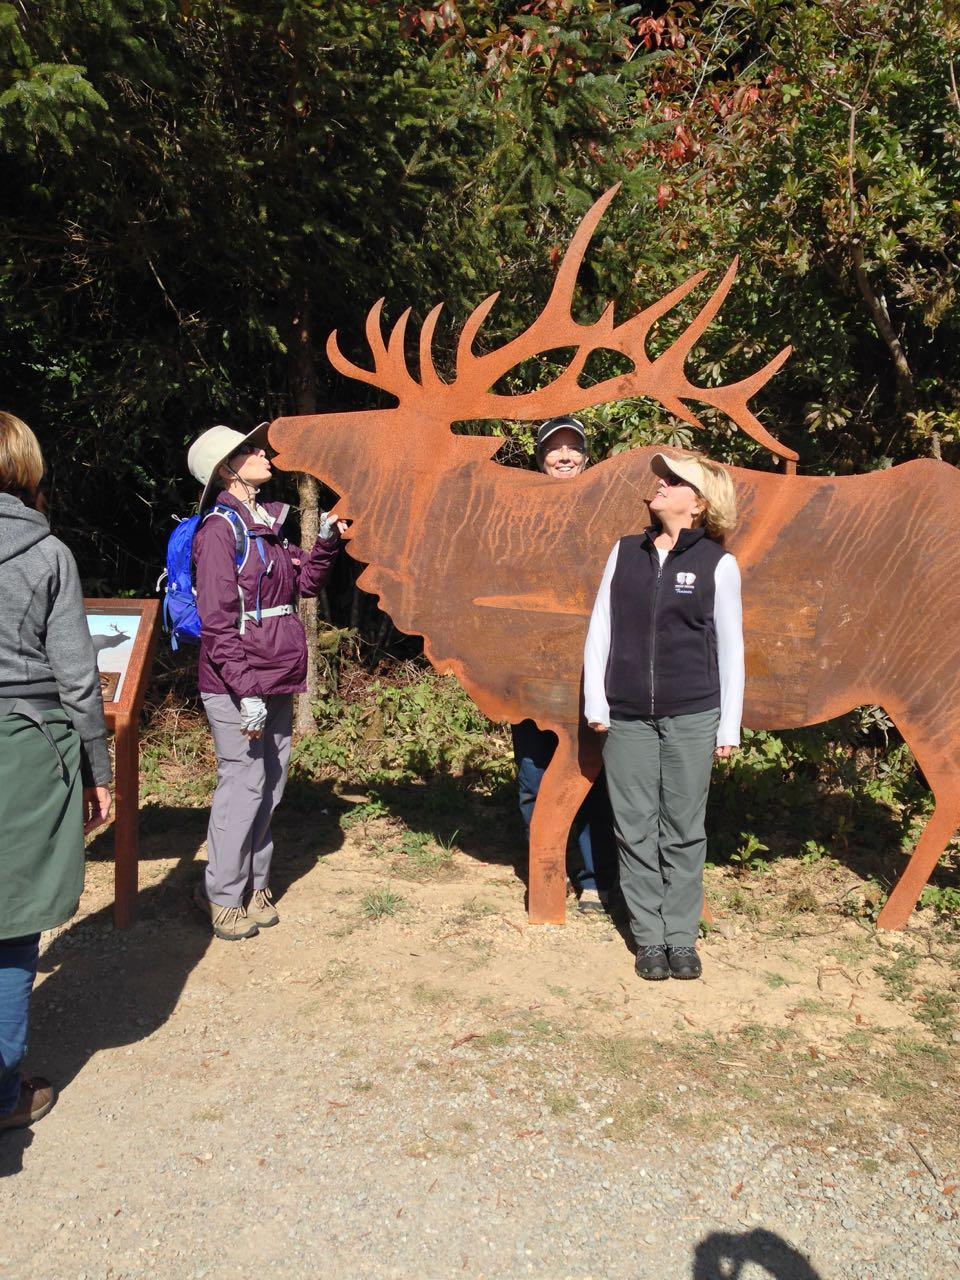 Redwoods 2017 10 08 259 Of 287